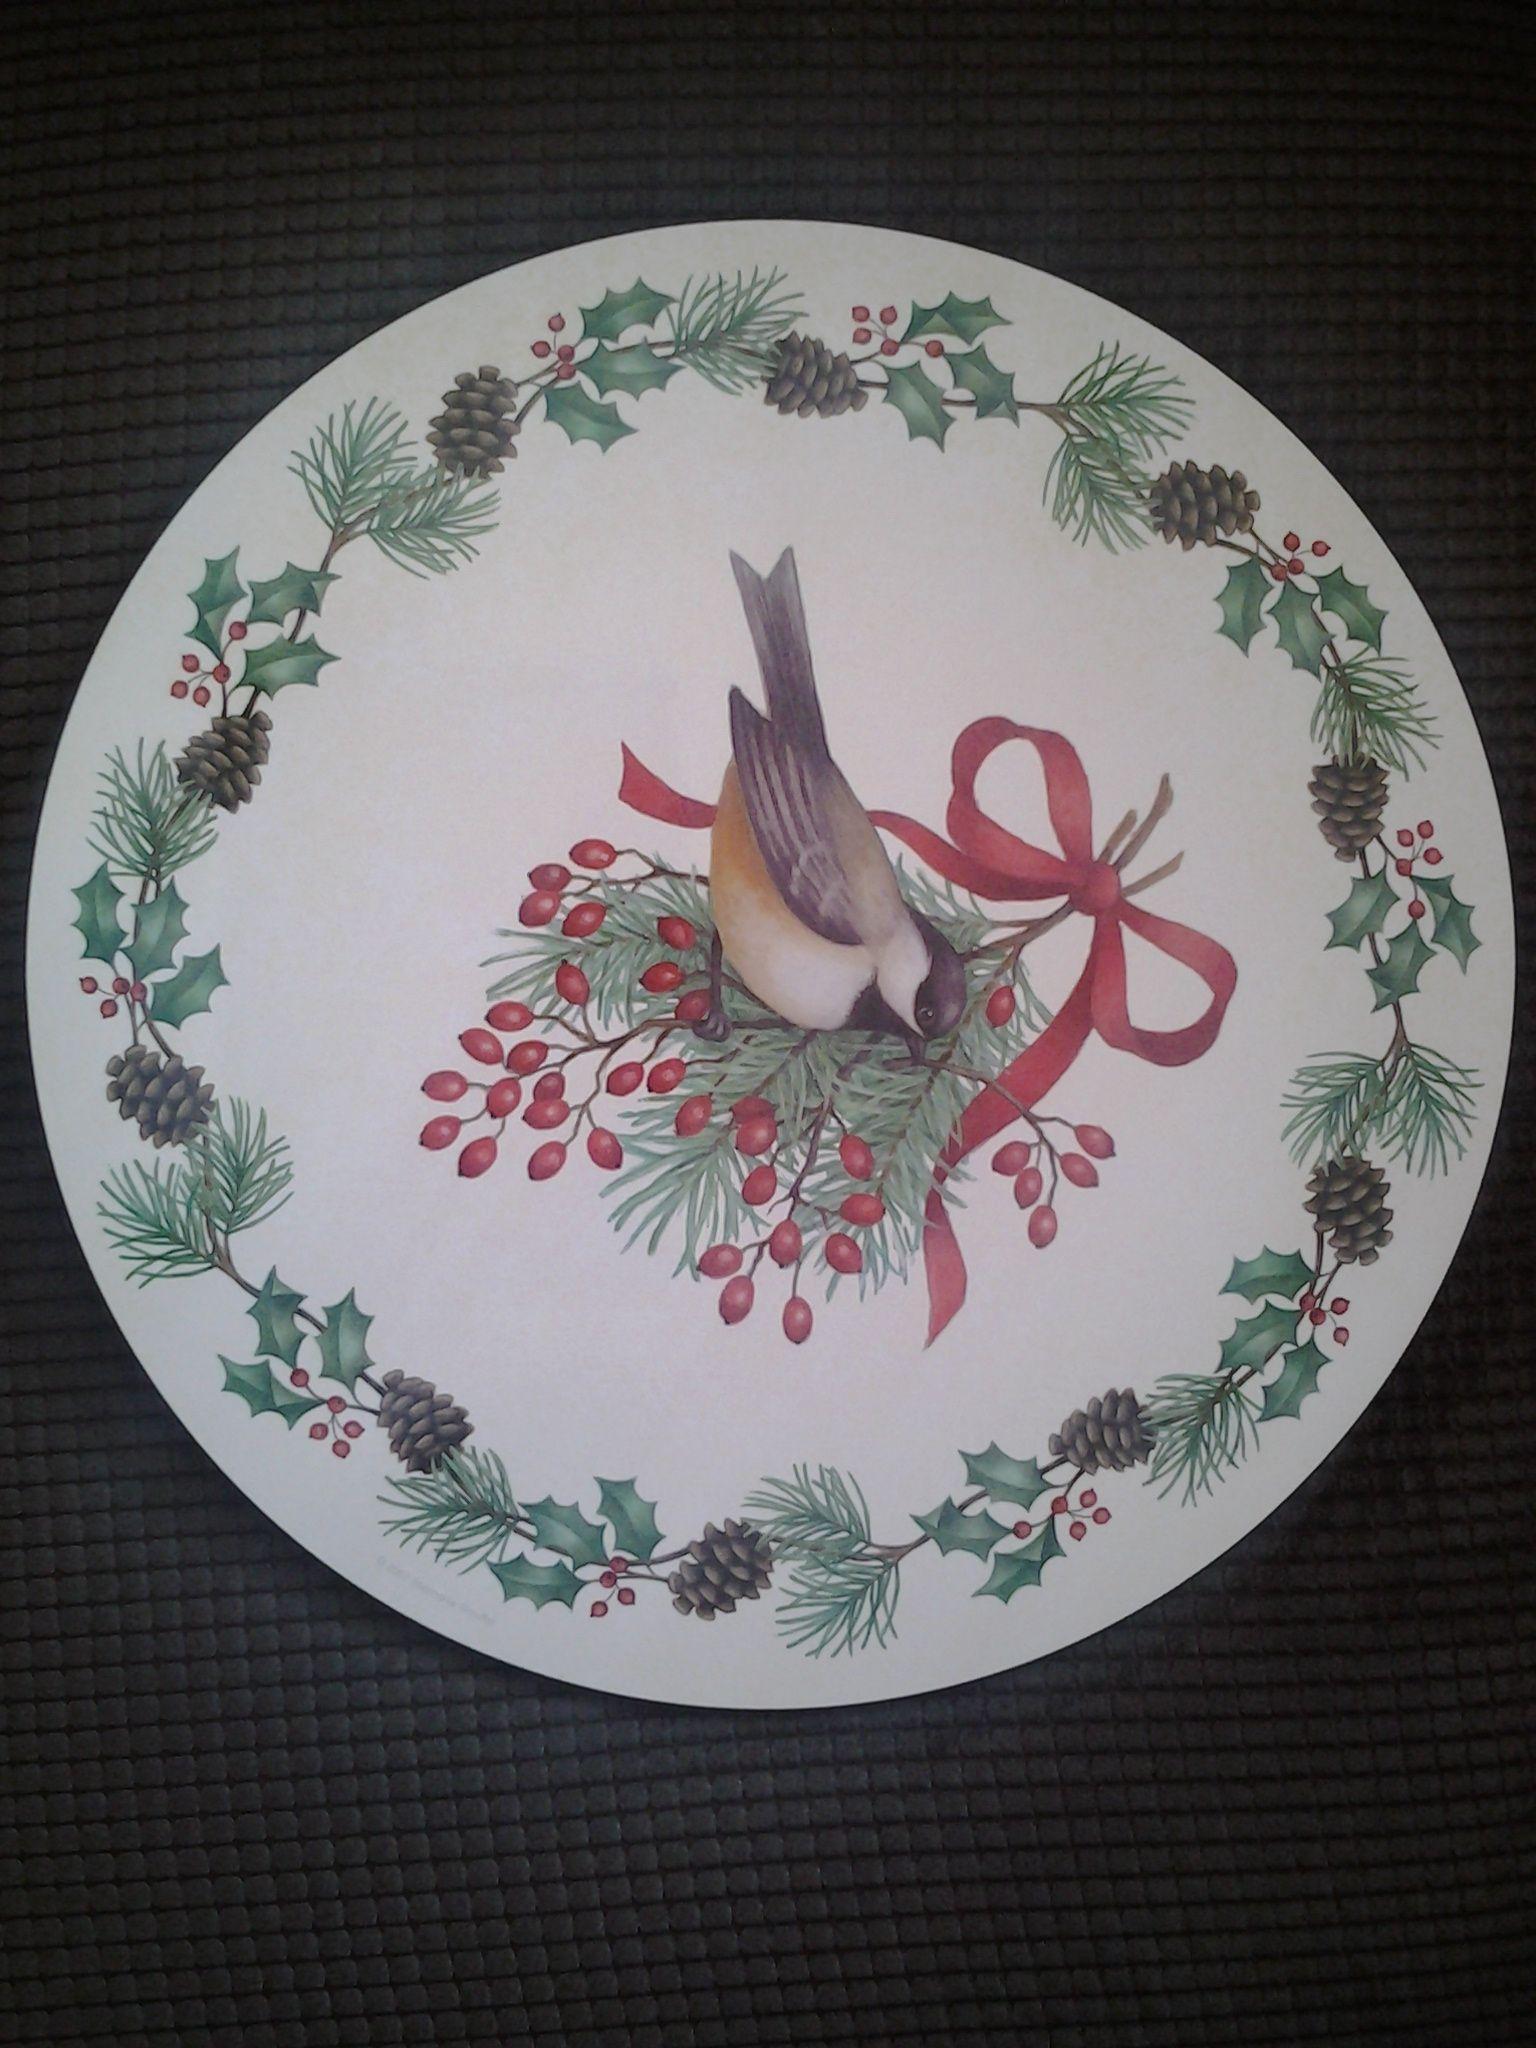 Jason Placemats New Zealand Birds - Home Decorating Ideas ...